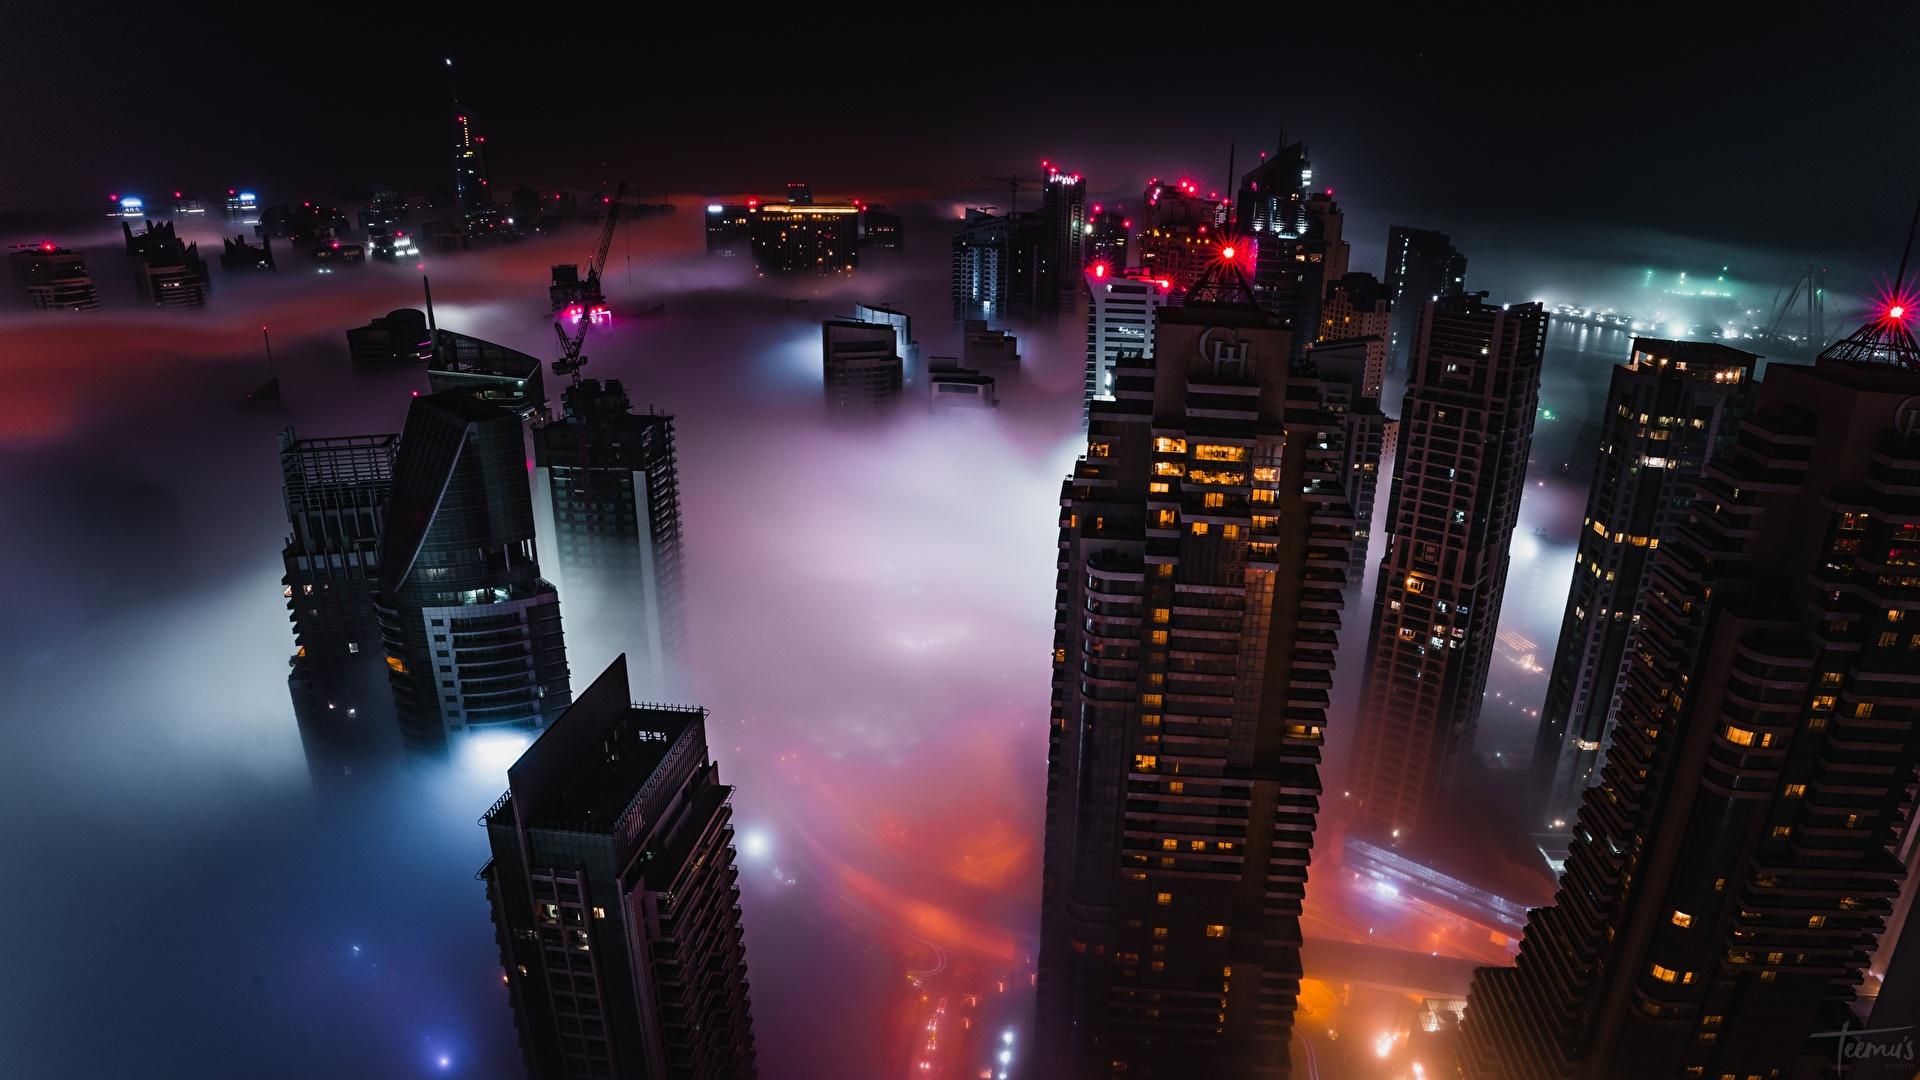 Pictures Dubai Emirates UAE Fog night time Skyscrapers Cities Building 1920x1080 Night Houses